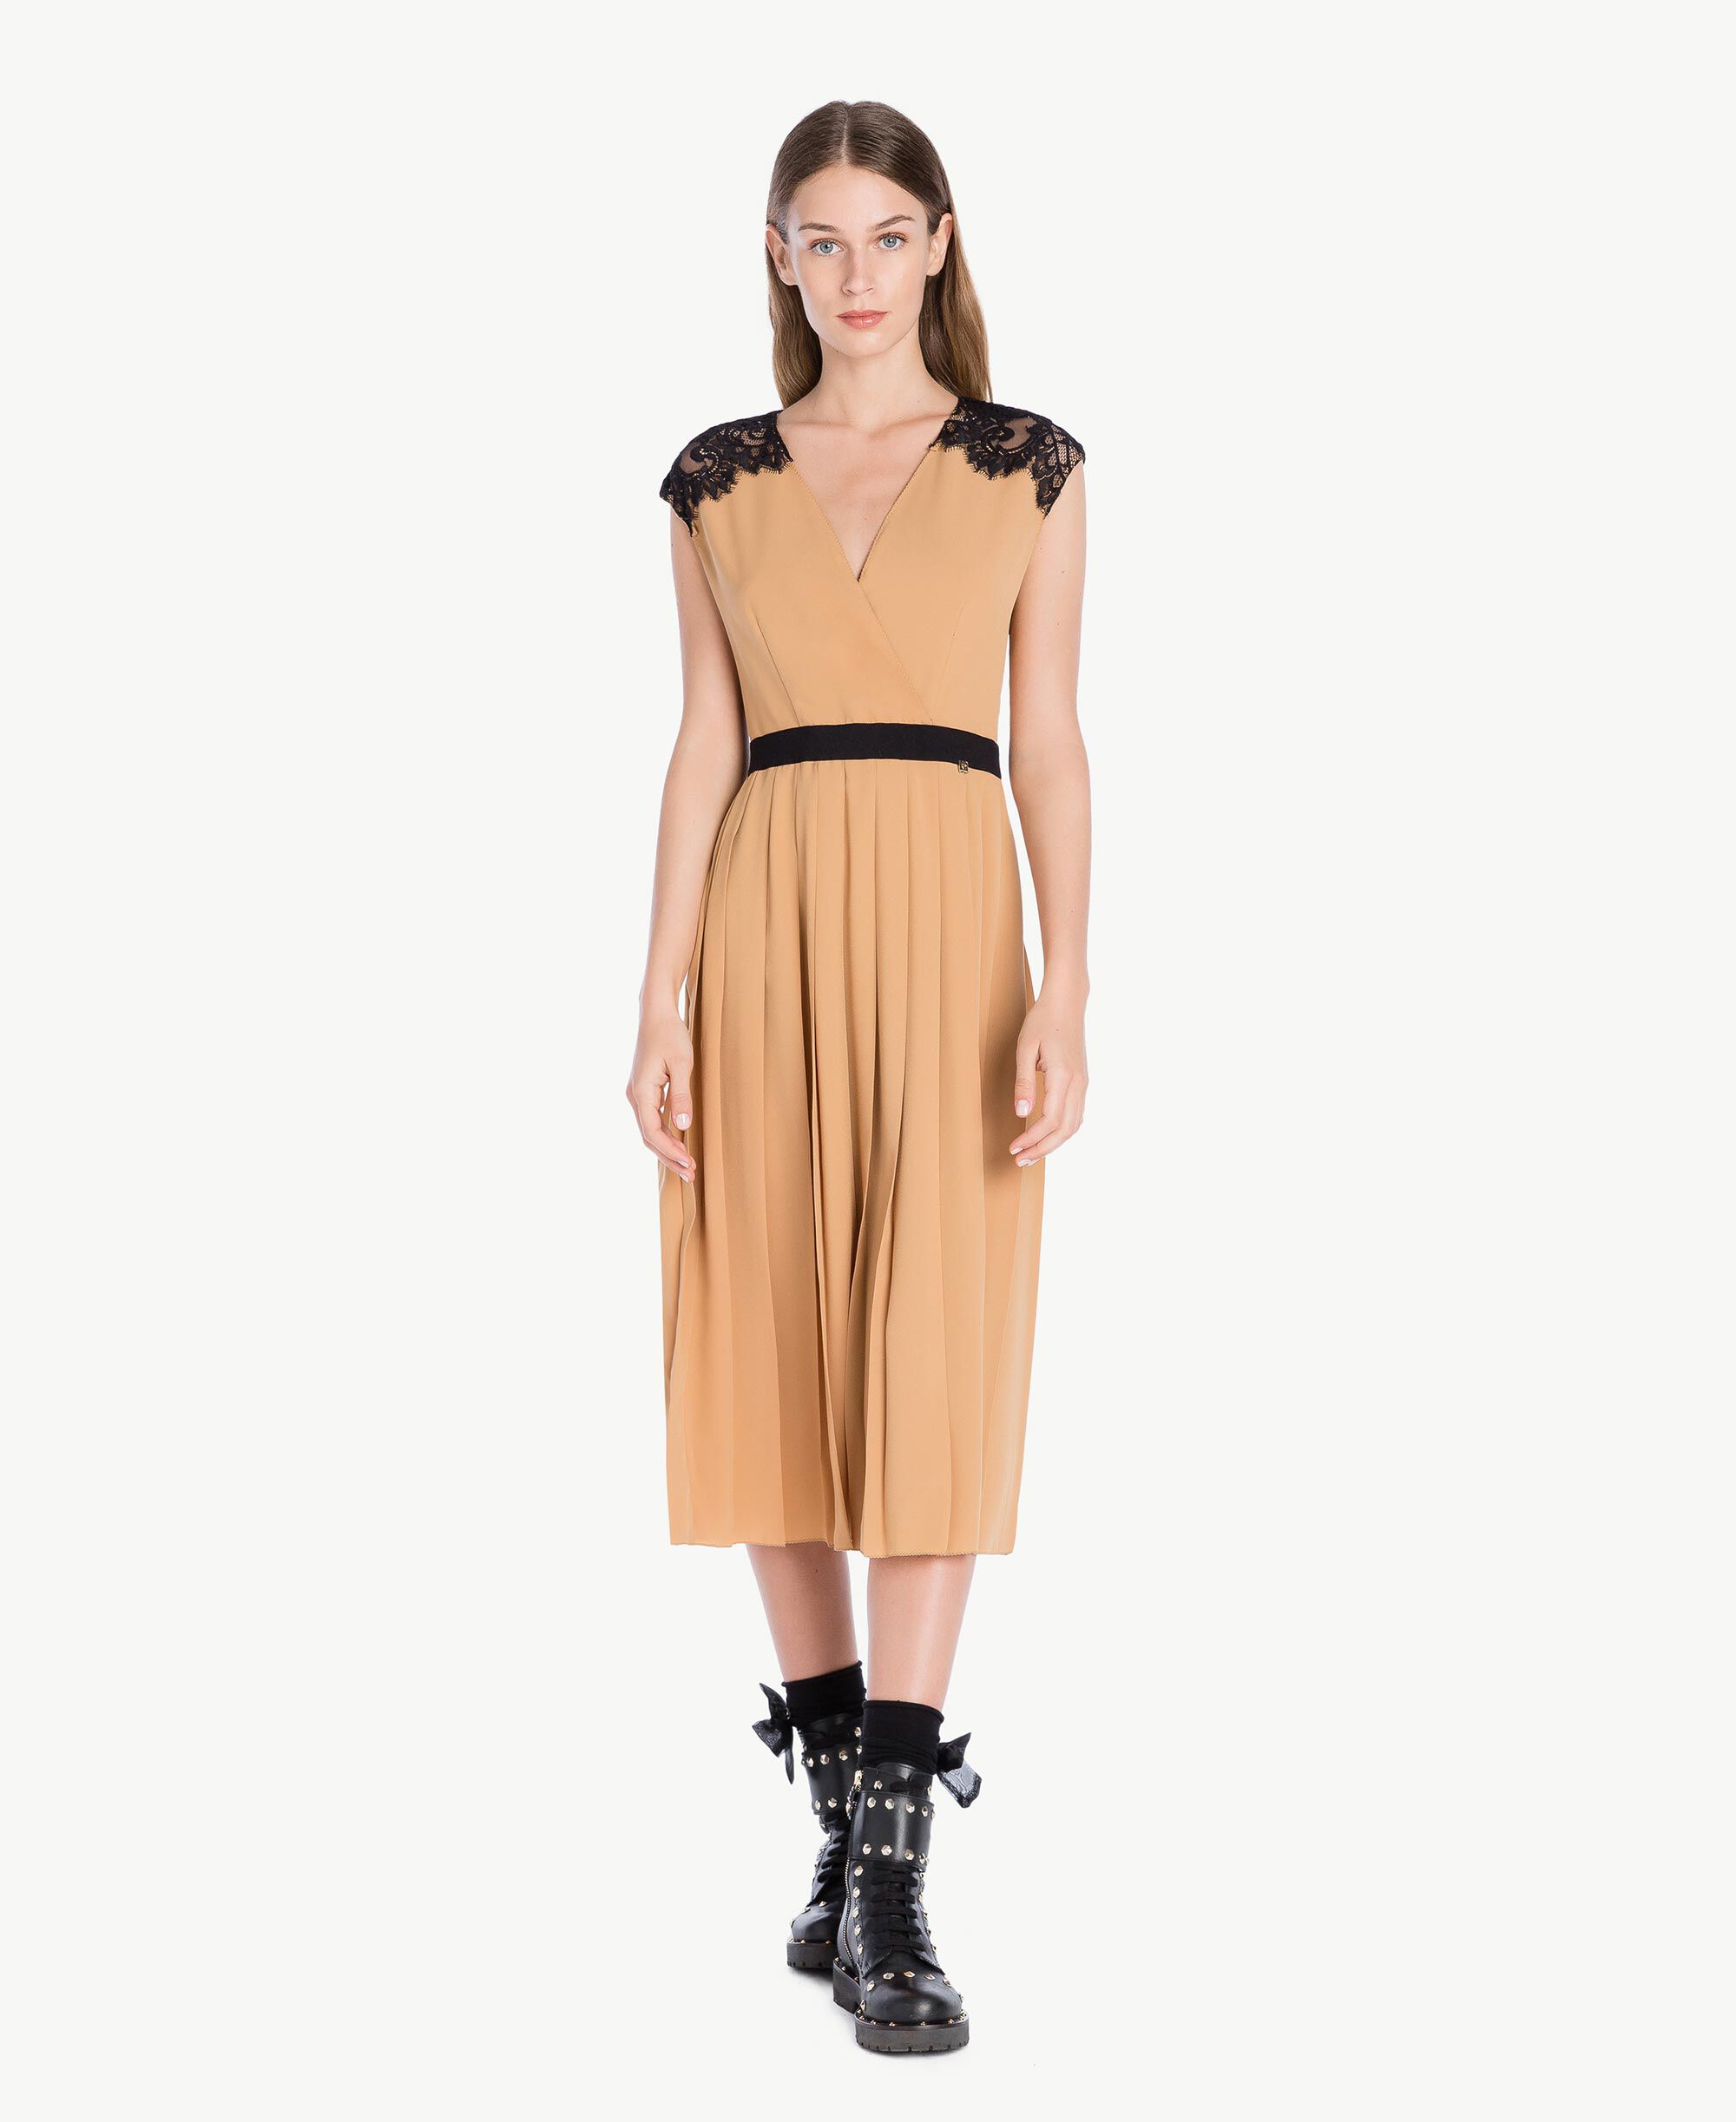 Medium Length Dresses